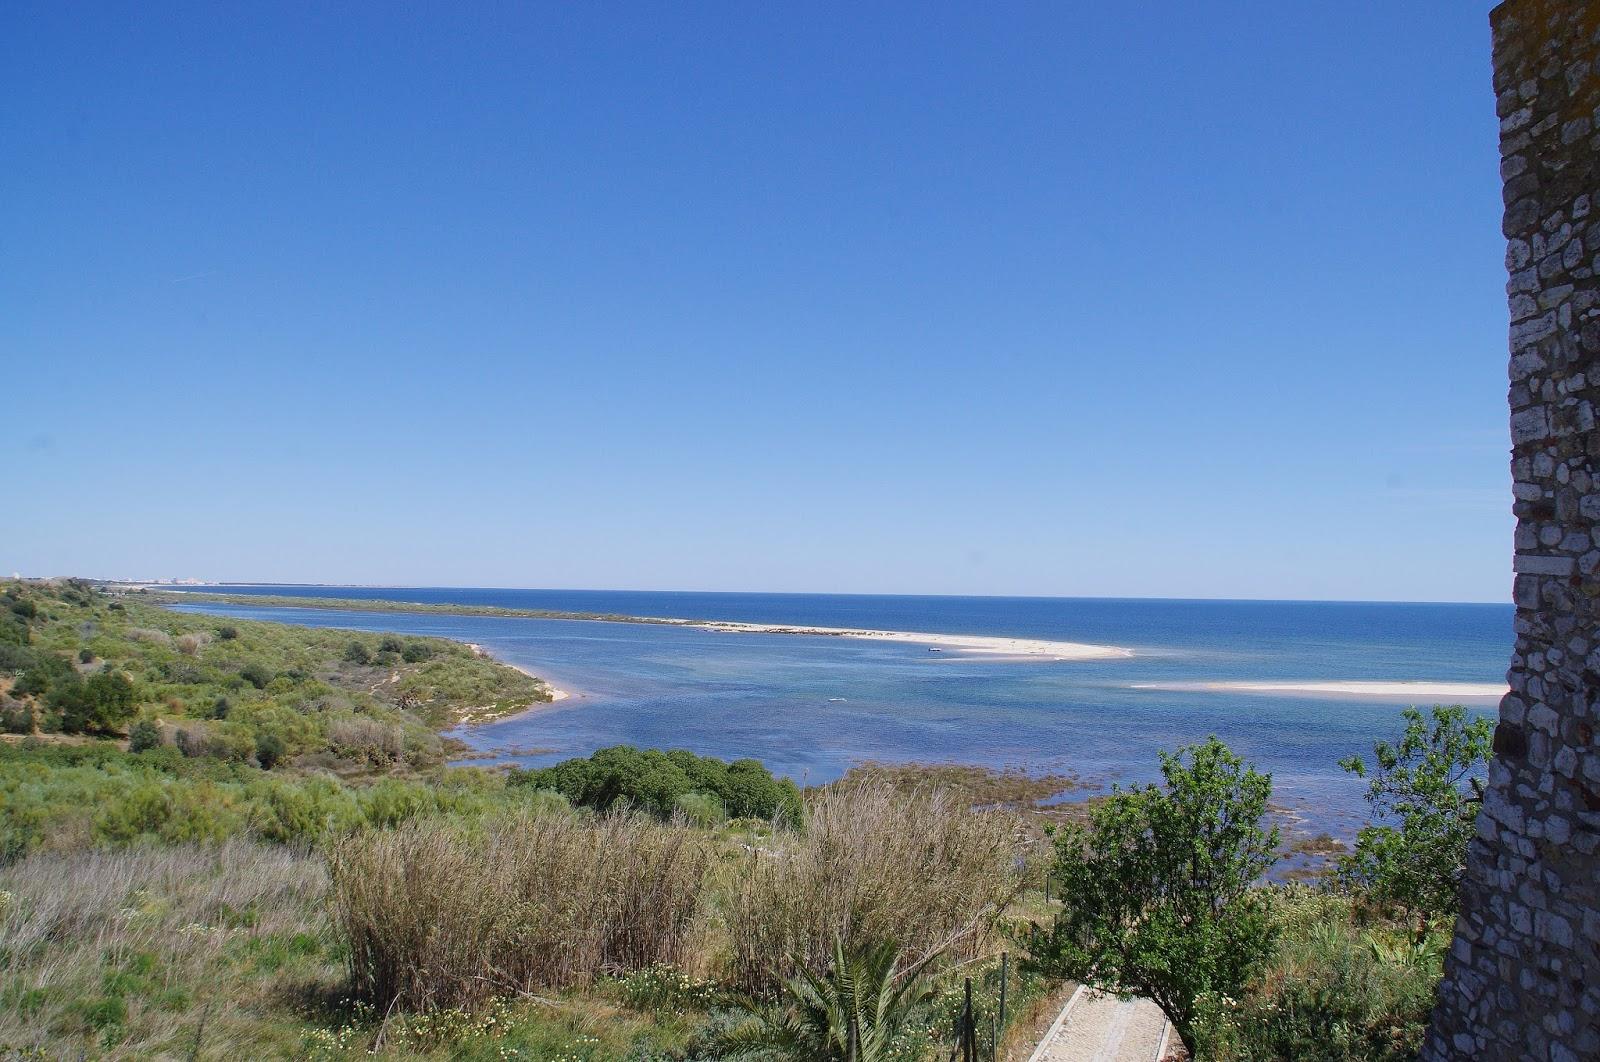 Ria Formosa Natural Park